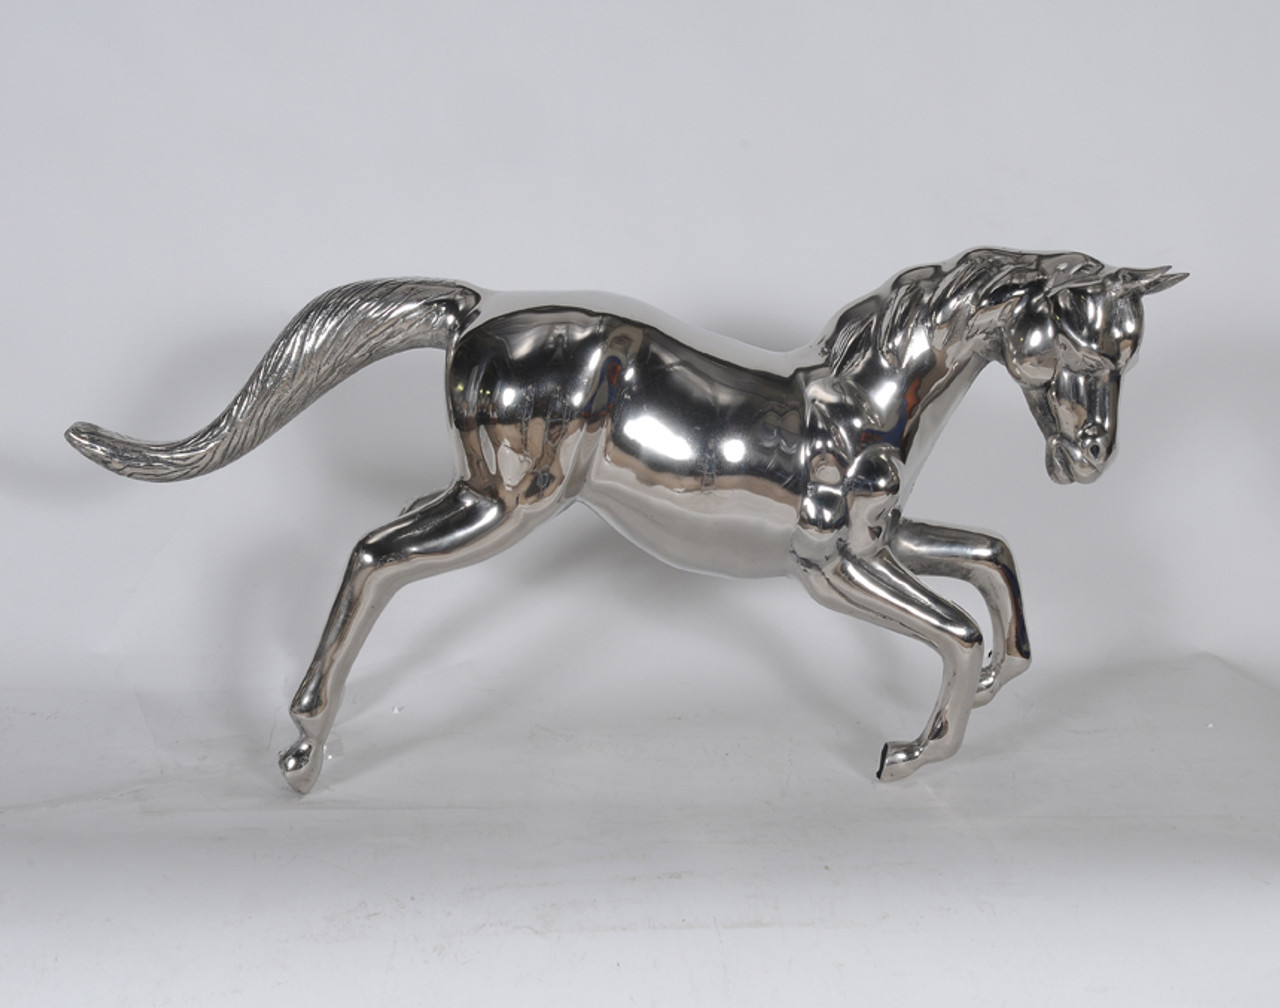 "Large Horse Statue Figurine 35"" Decorative Chrome Metal Home Decor"